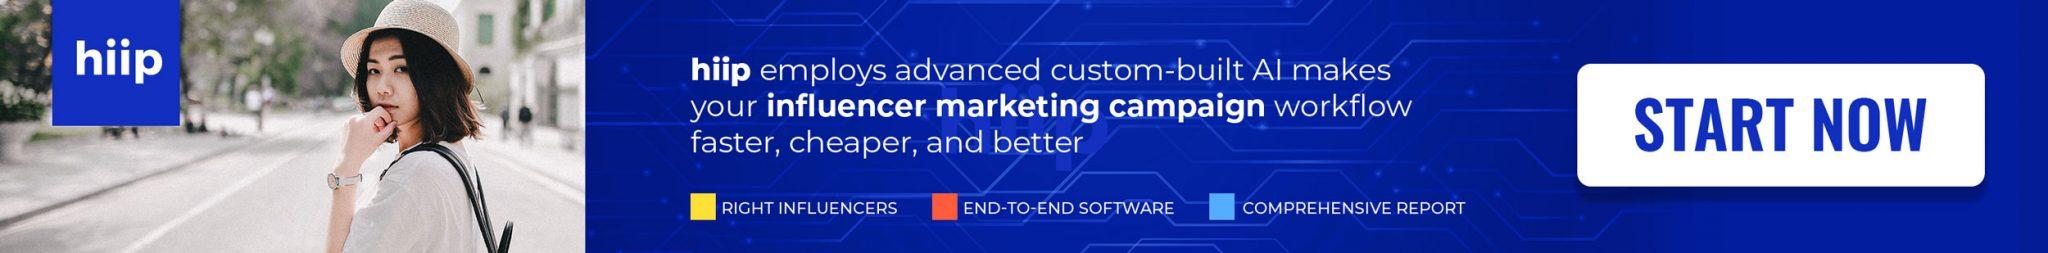 Hiip - Influencer Marketing Platform with Artificial Intelligence